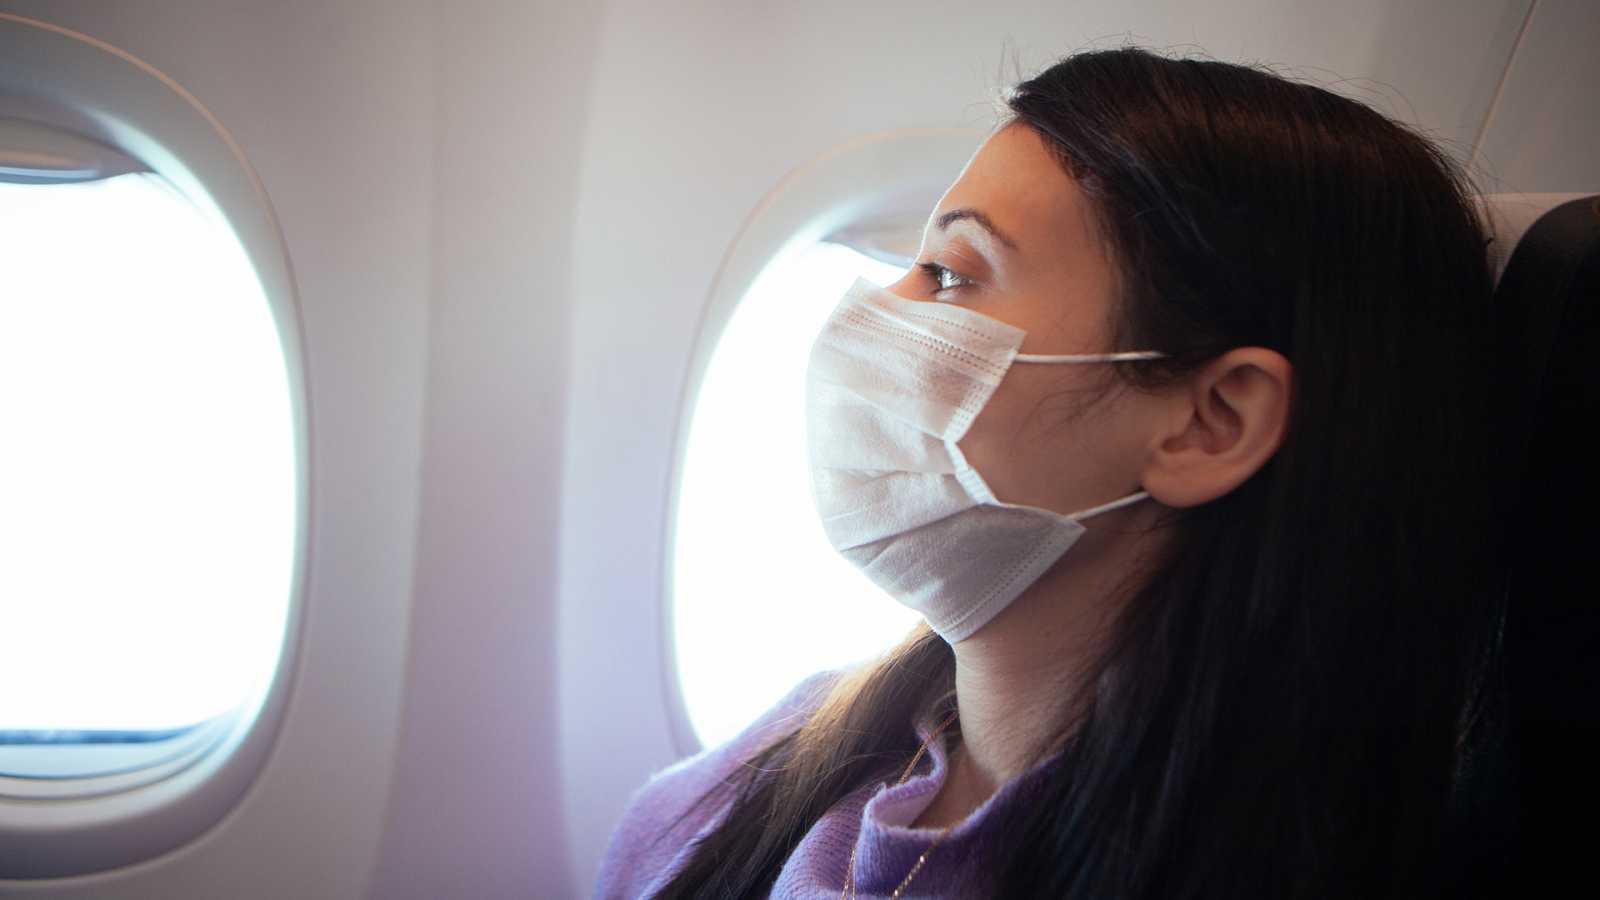 A golpe de bit - Volar en avión en la era poscoronavirus - 05/06/20 - escuchar ahora